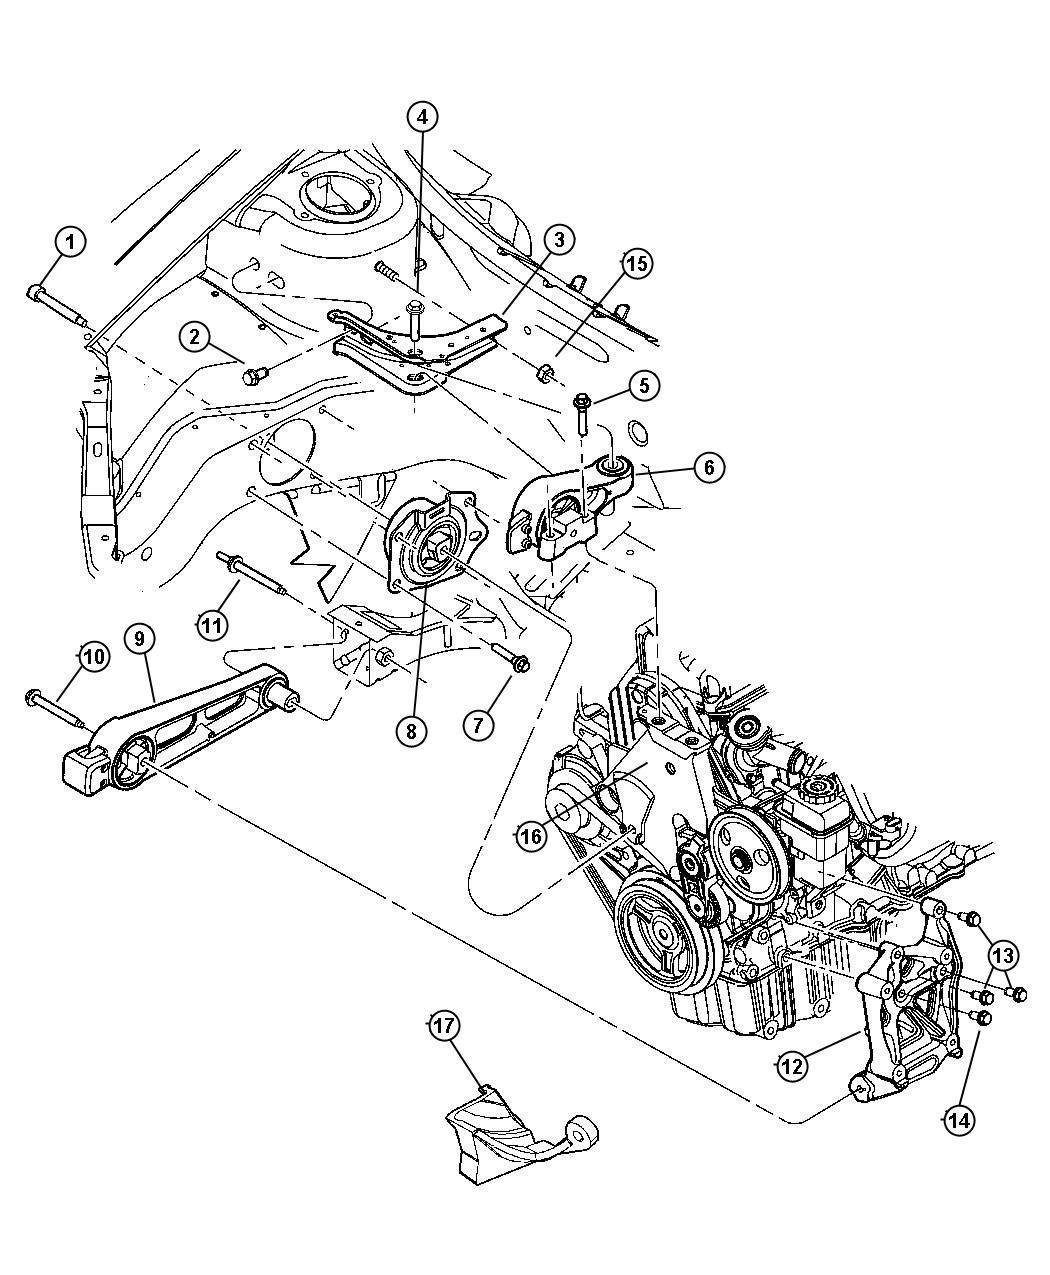 2011 Dodge Ram 4500 Bracket, isolator, strut. Manual